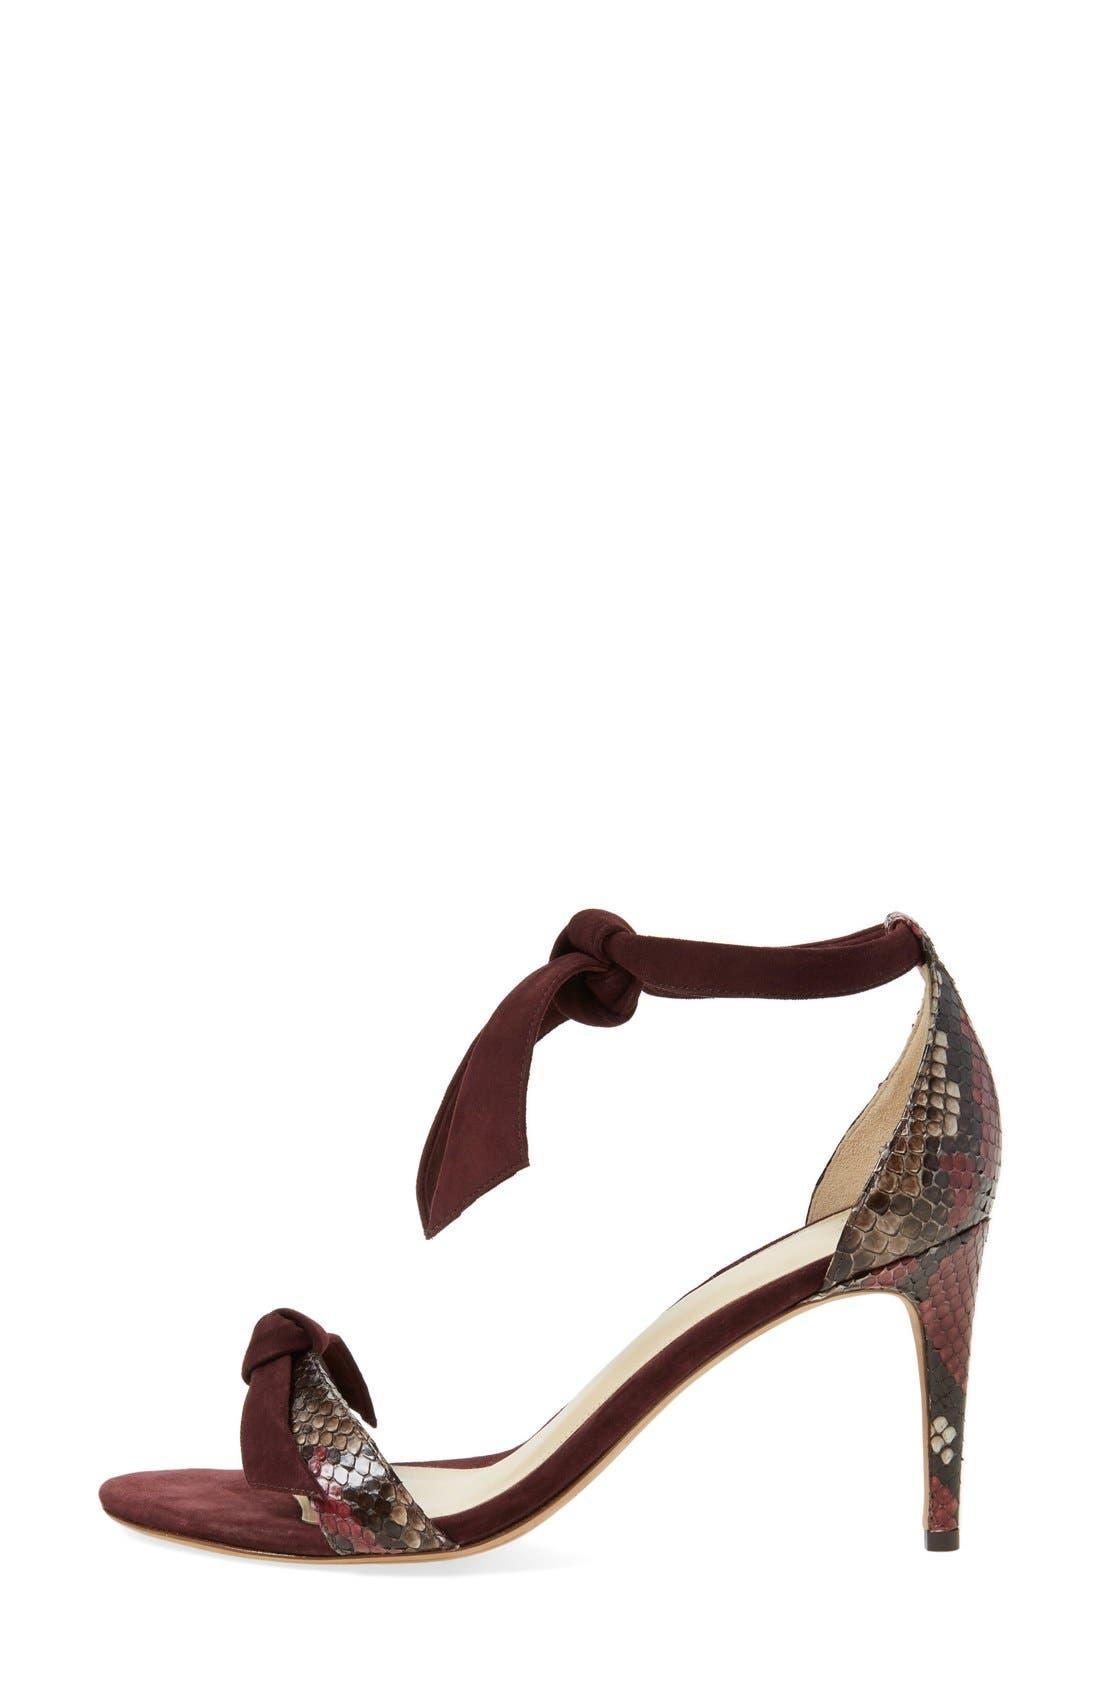 Alternate Image 4  - Alexandre Birman 'Clarita' Suede & Genuine Python Ankle Tie Sandal (Women) (Nordstrom Exclusive)